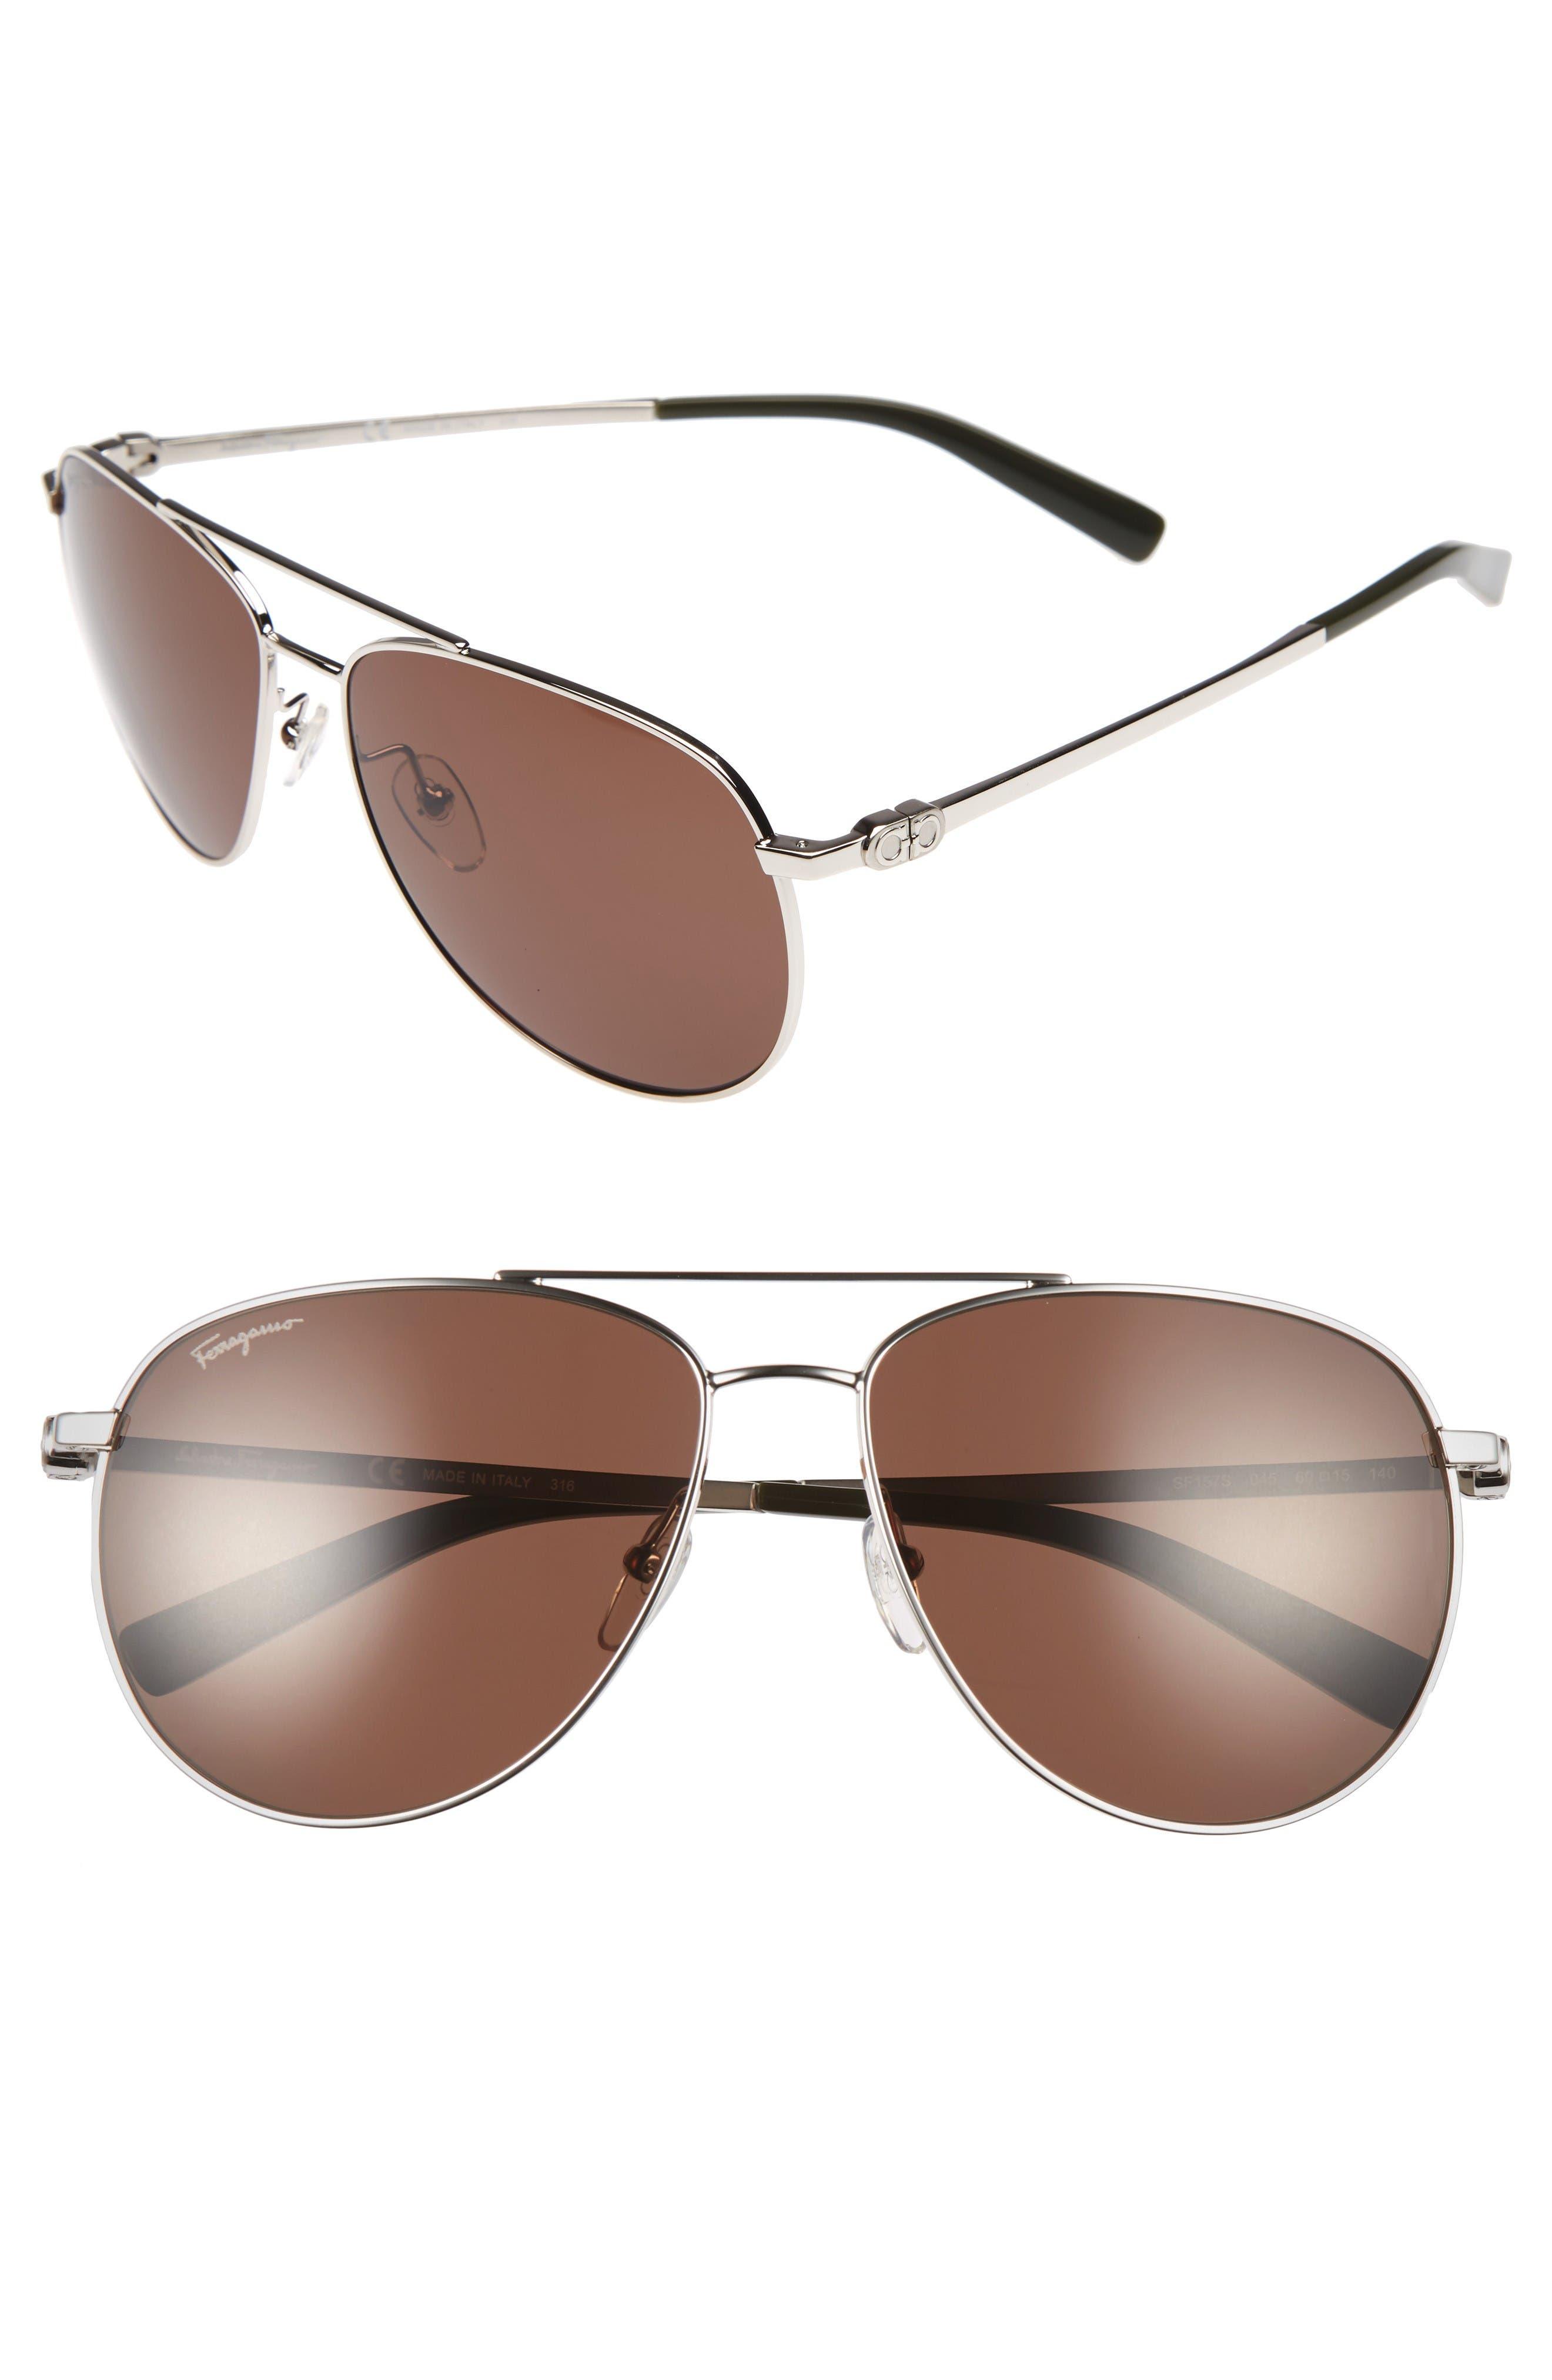 Salvatore Ferragamo Gancio 60mm Aviator Sunglasses